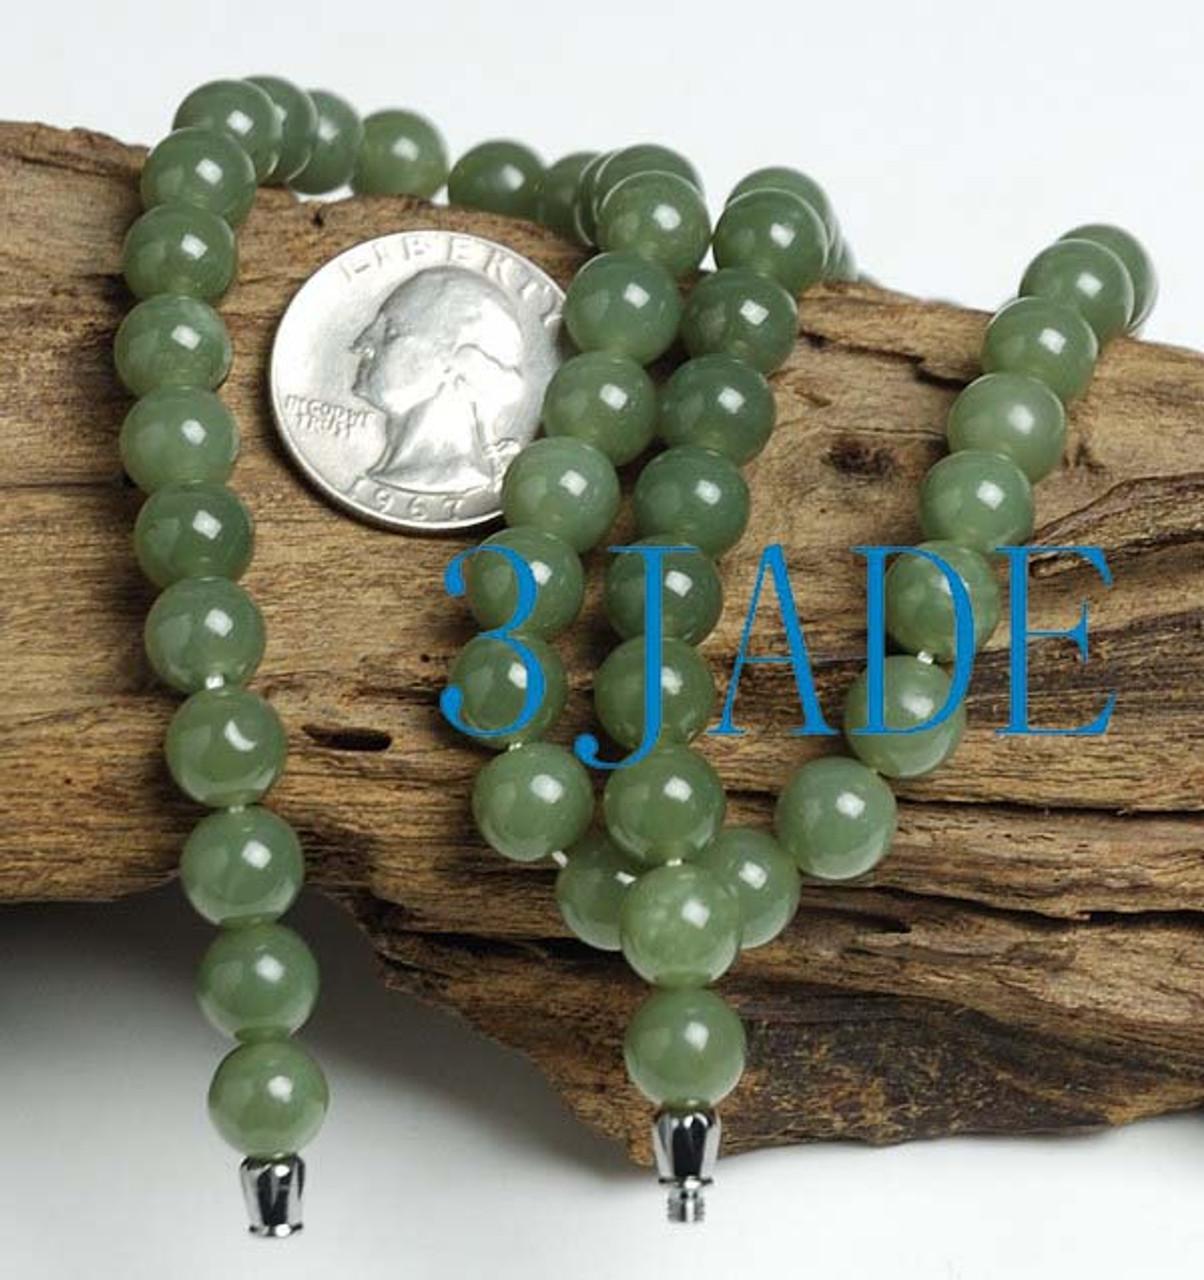 celadon nephrite jade necklace